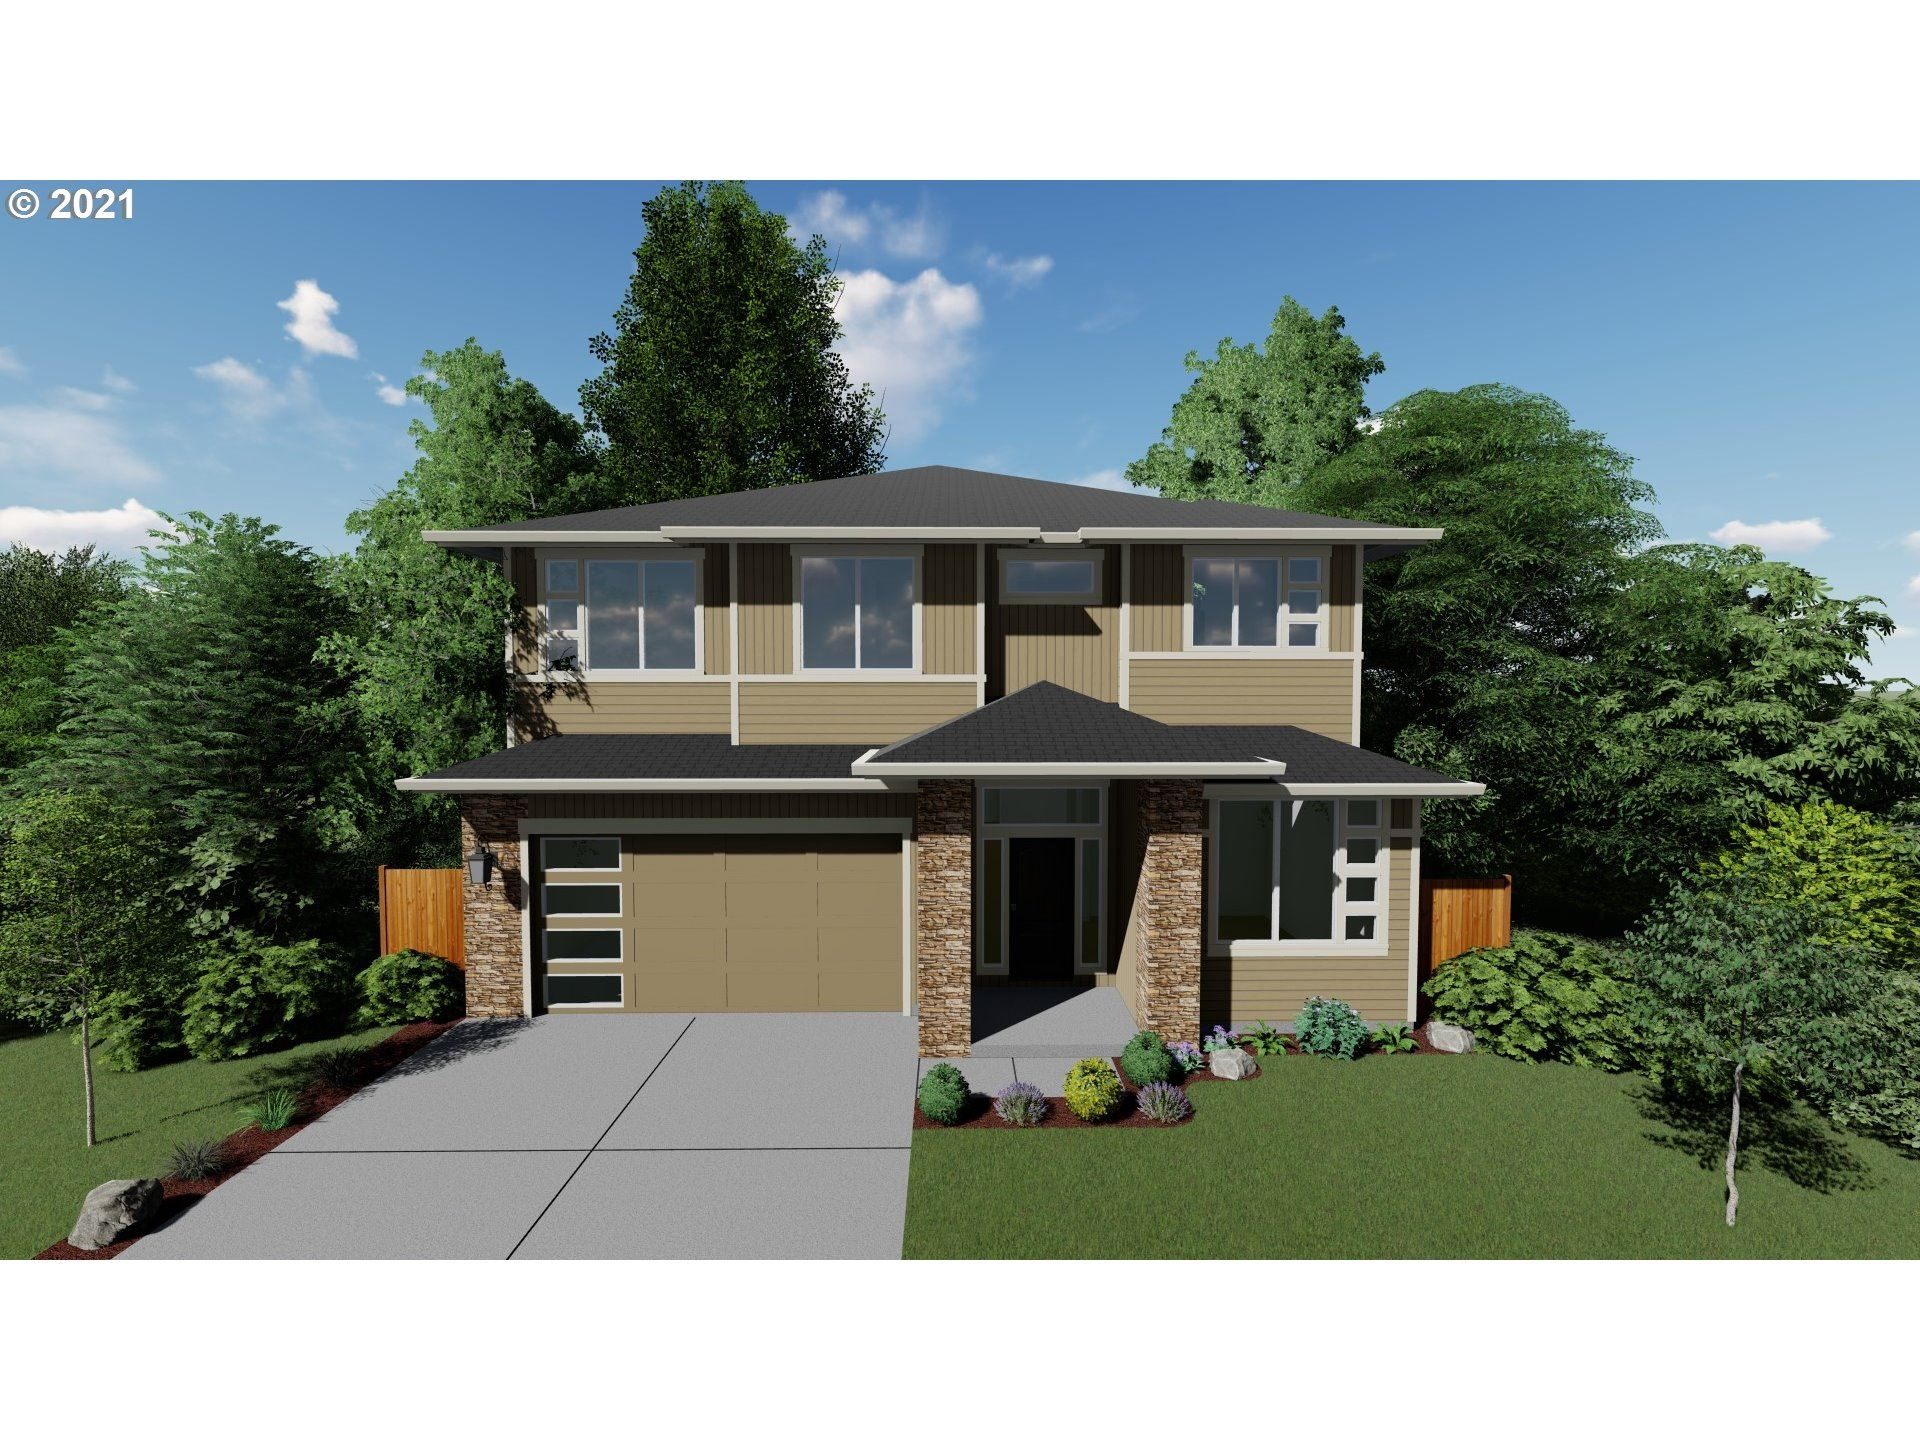 16657 NW Crossvine ST #Lt131, Portland, OR 97229 - MLS#: 21384475